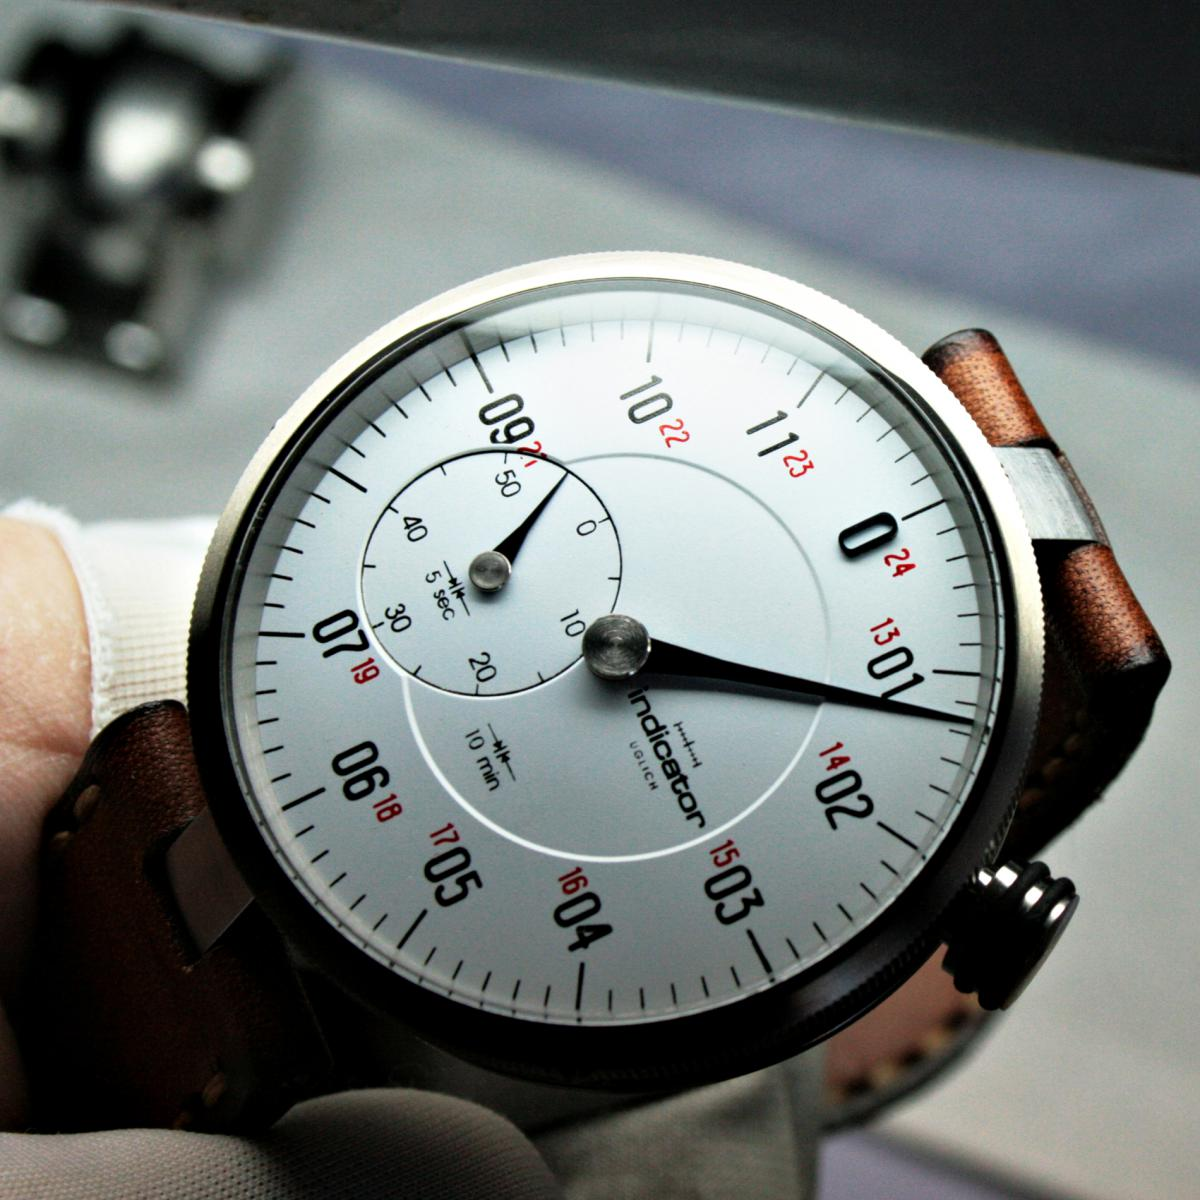 New RUSSIAN time tool INDICATOR-img_7520.jpg